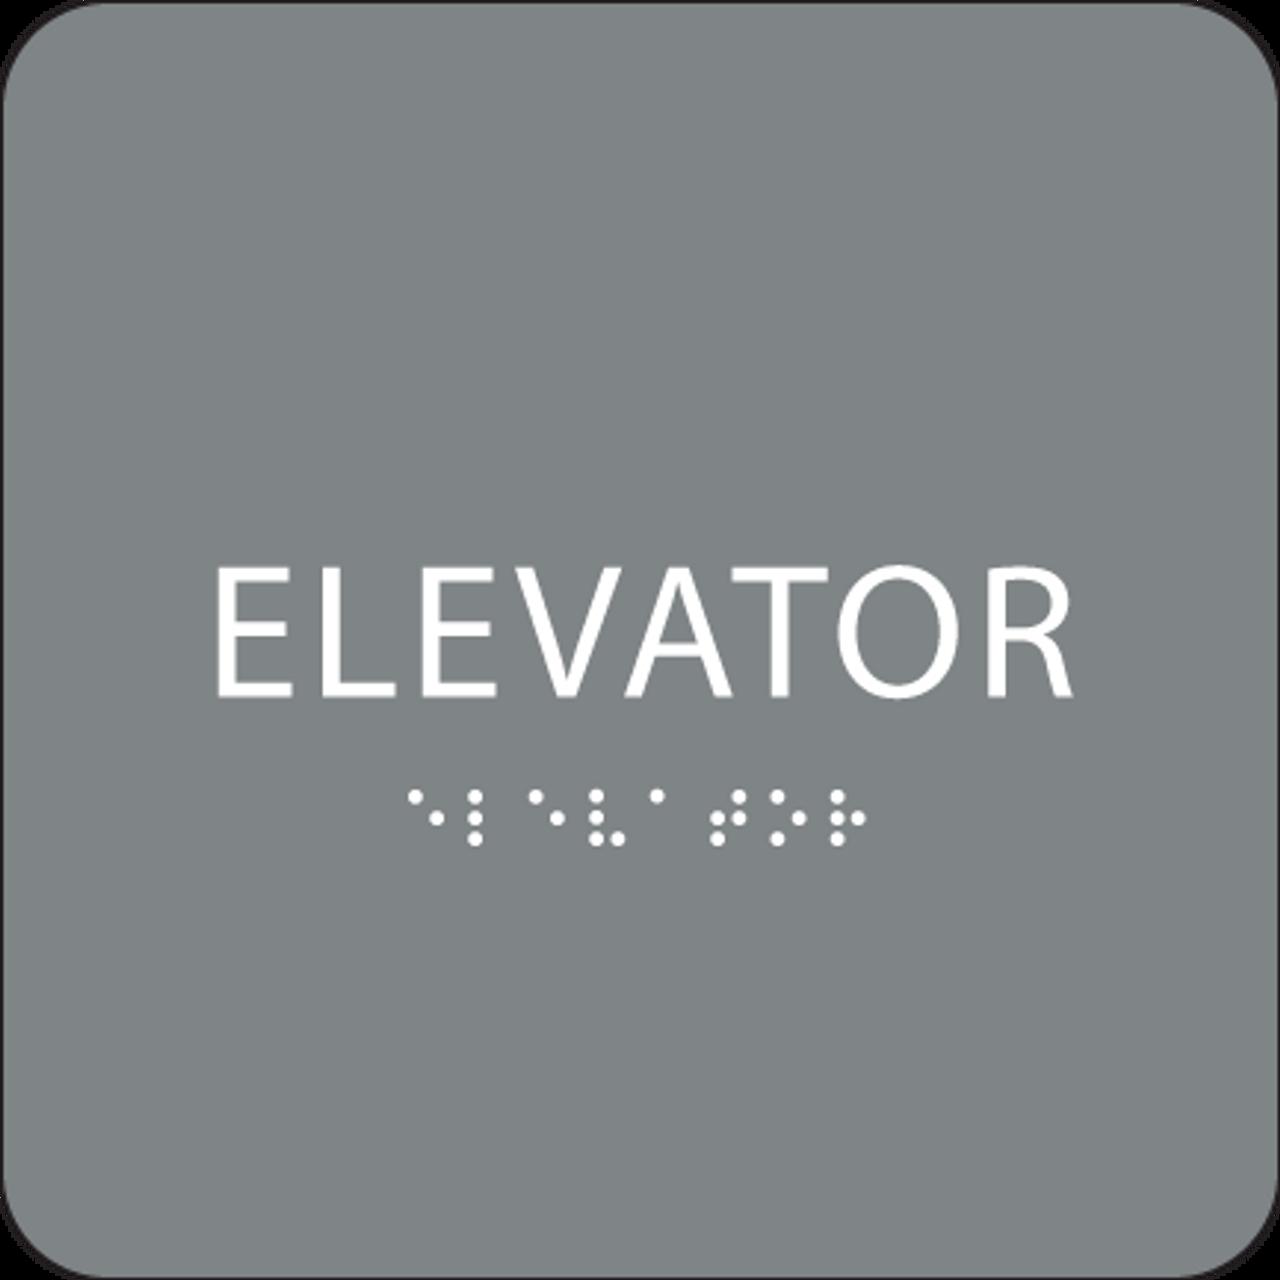 Grey ADA Elevator Sign